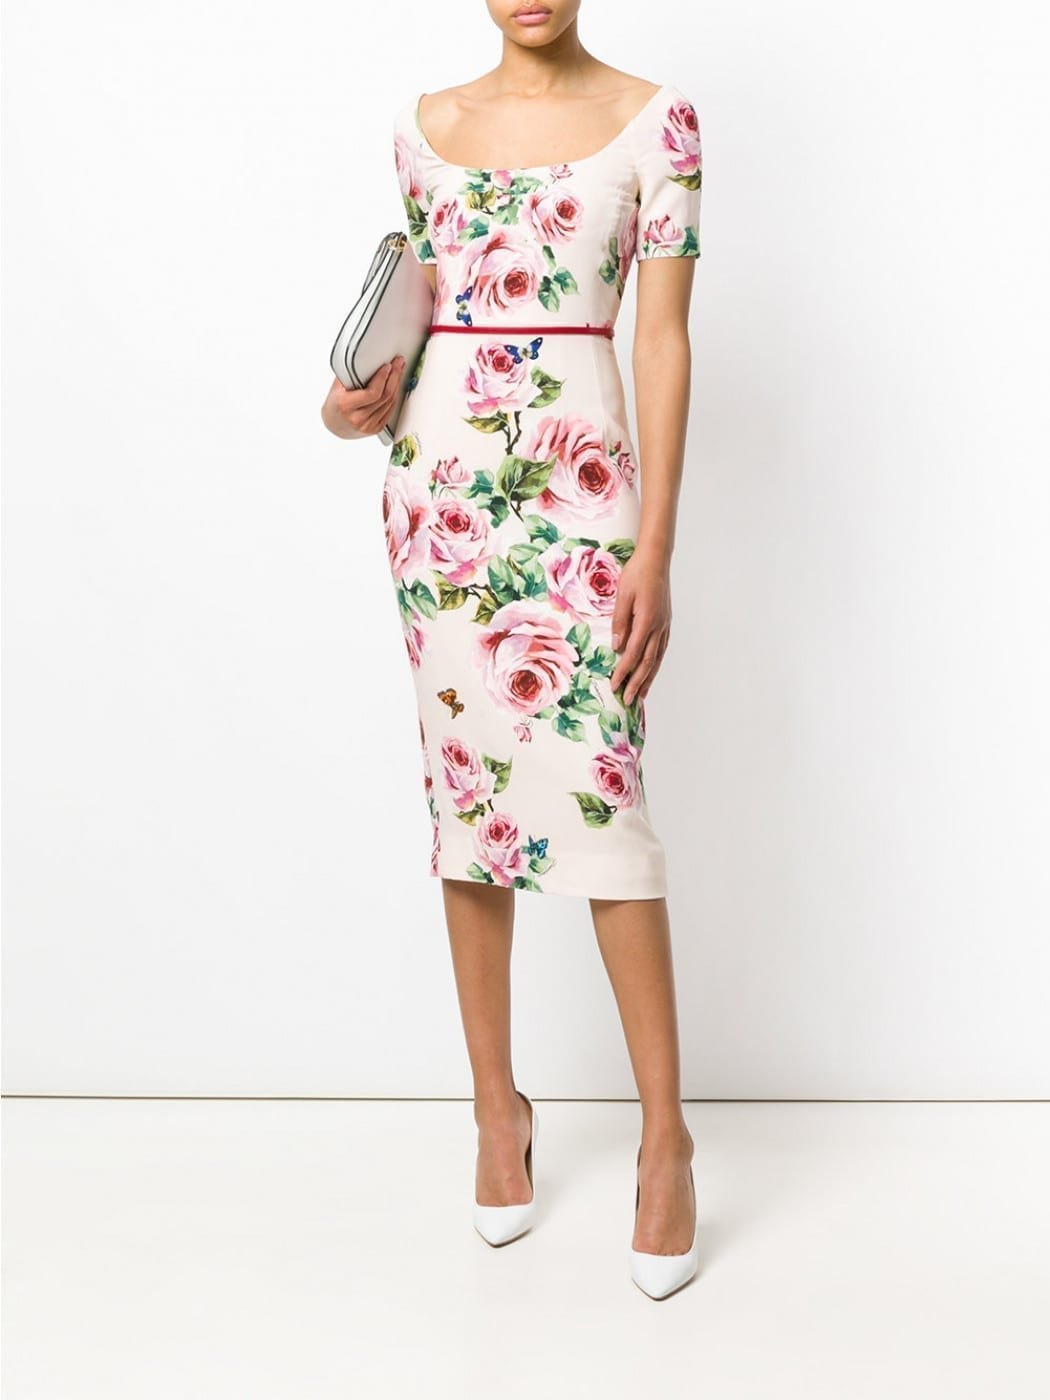 Dolce gabbana flower print light pink dress we select dresses dolce gabbana flower print light pink dress mightylinksfo